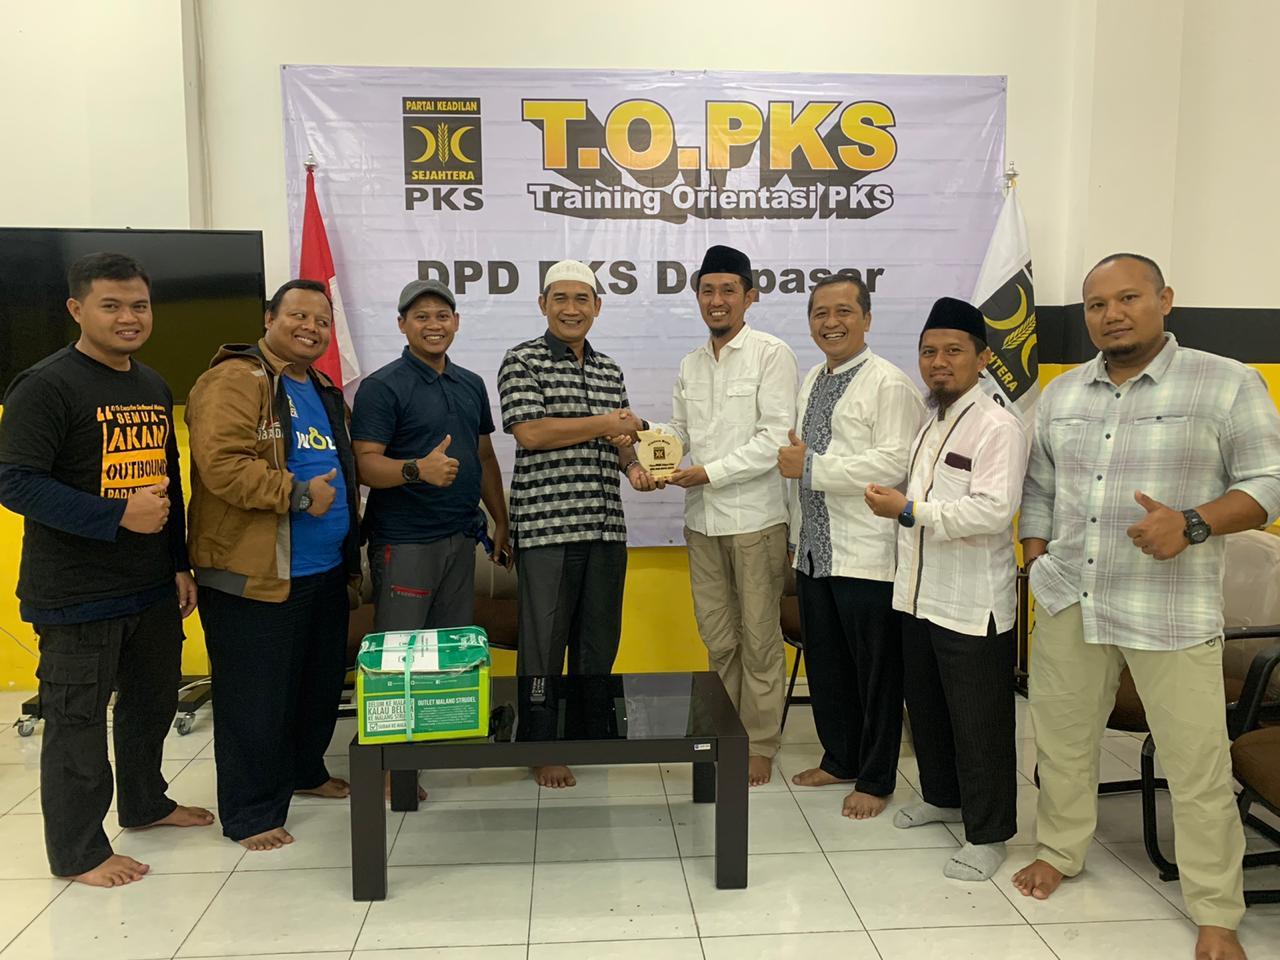 Kunjungan ke DPW PKS Bali